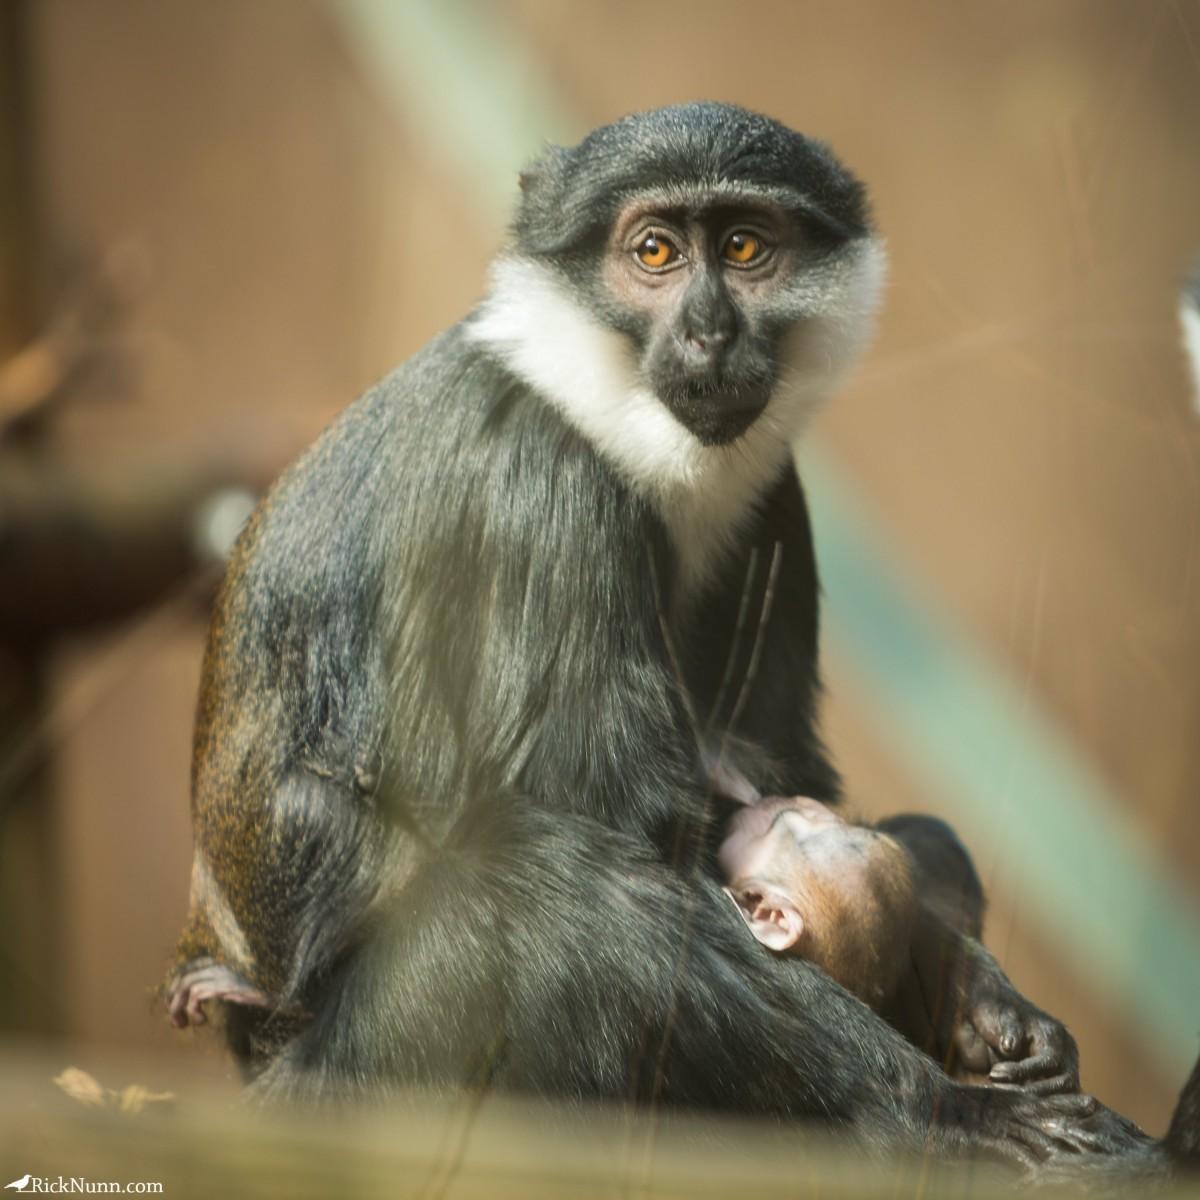 Twycross Zoo, Warwickshire - Twycross Zoo 2018 - 9 Photographed by Rick Nunn